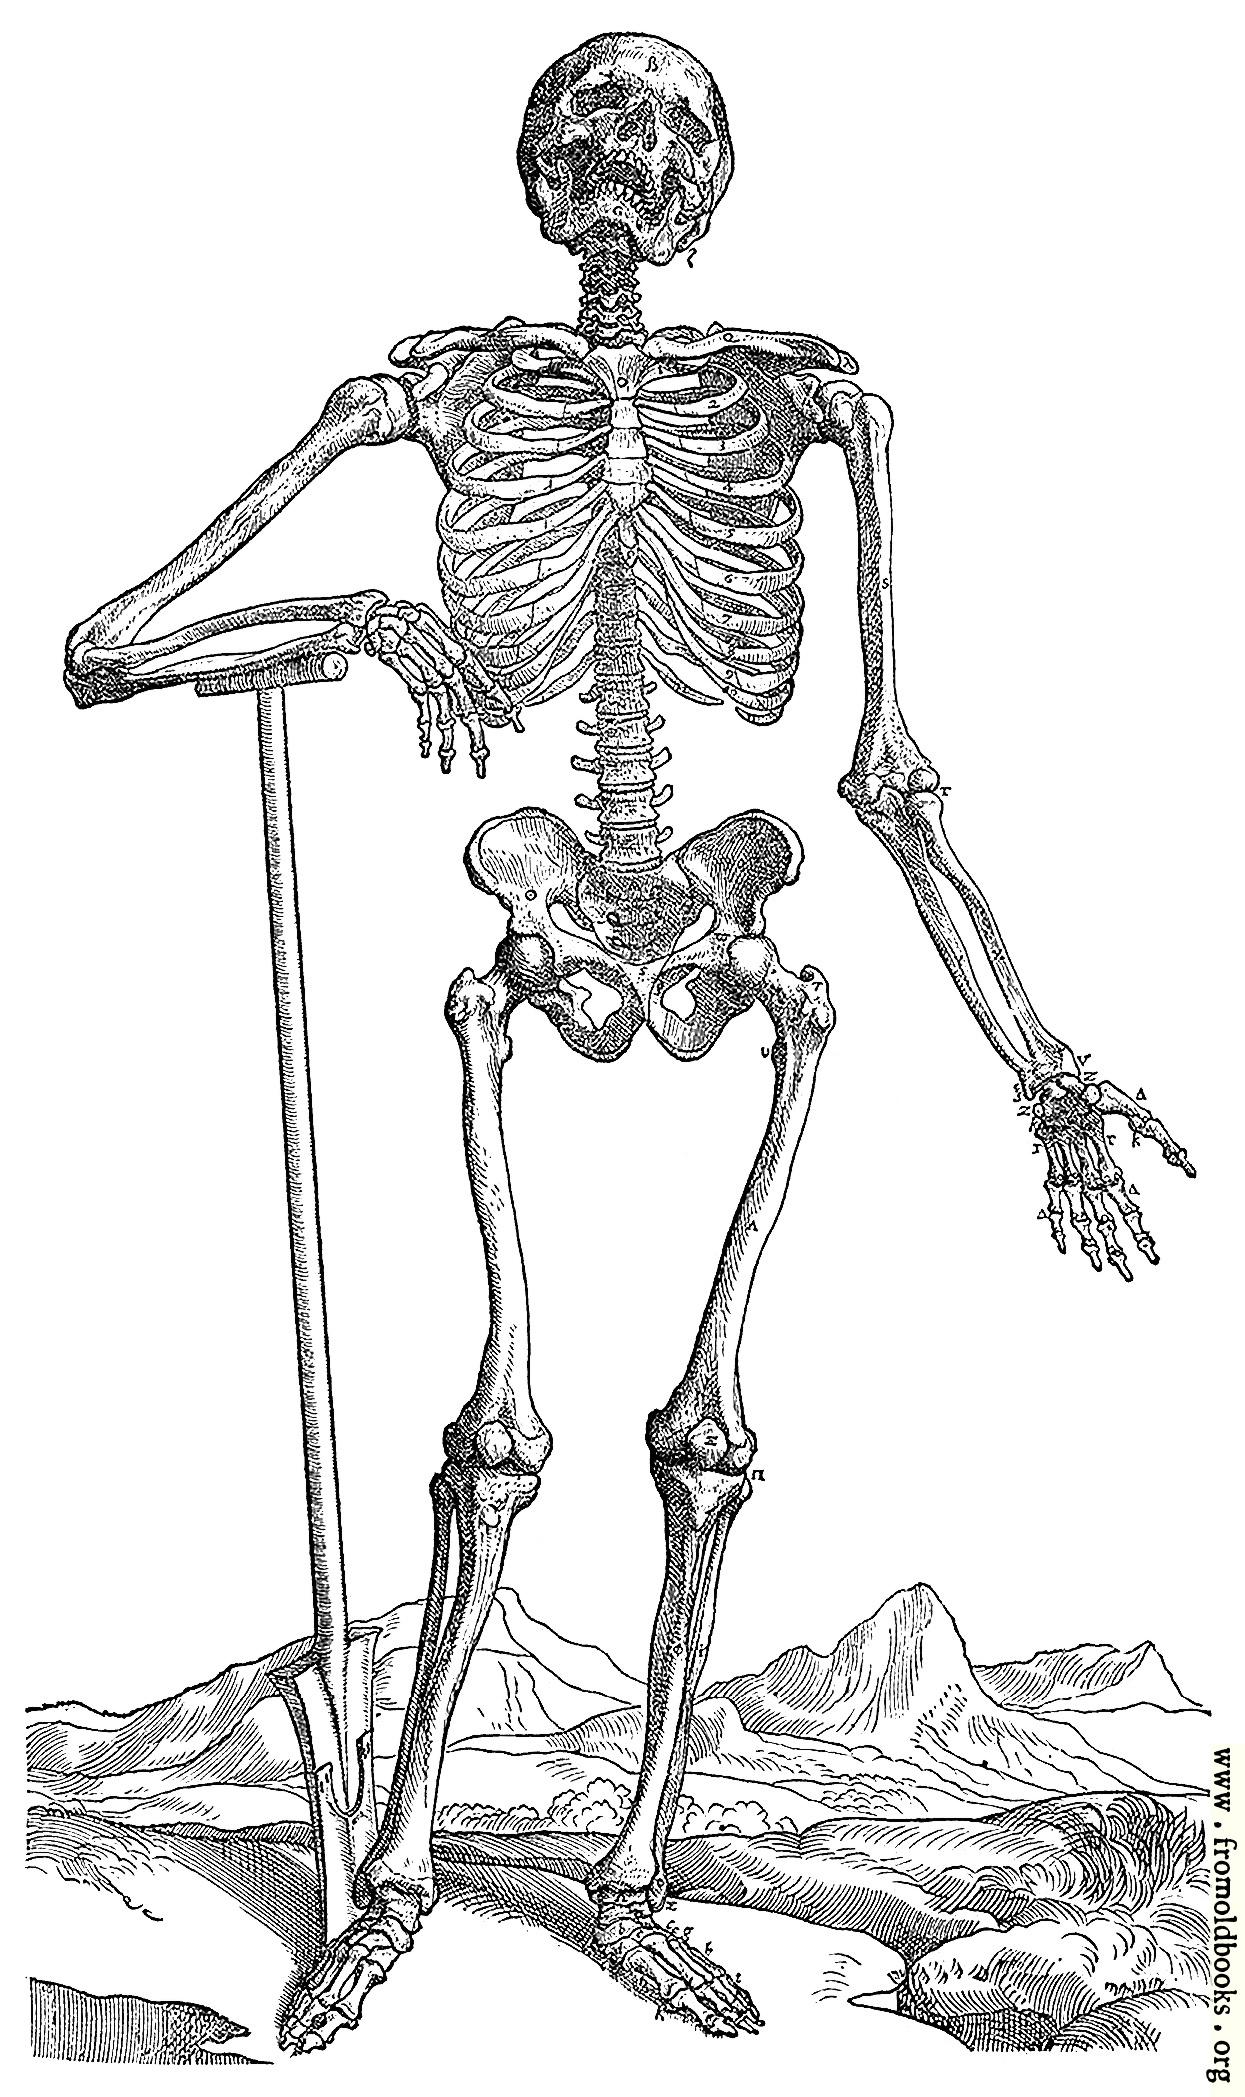 163 Skeleton With Shovel